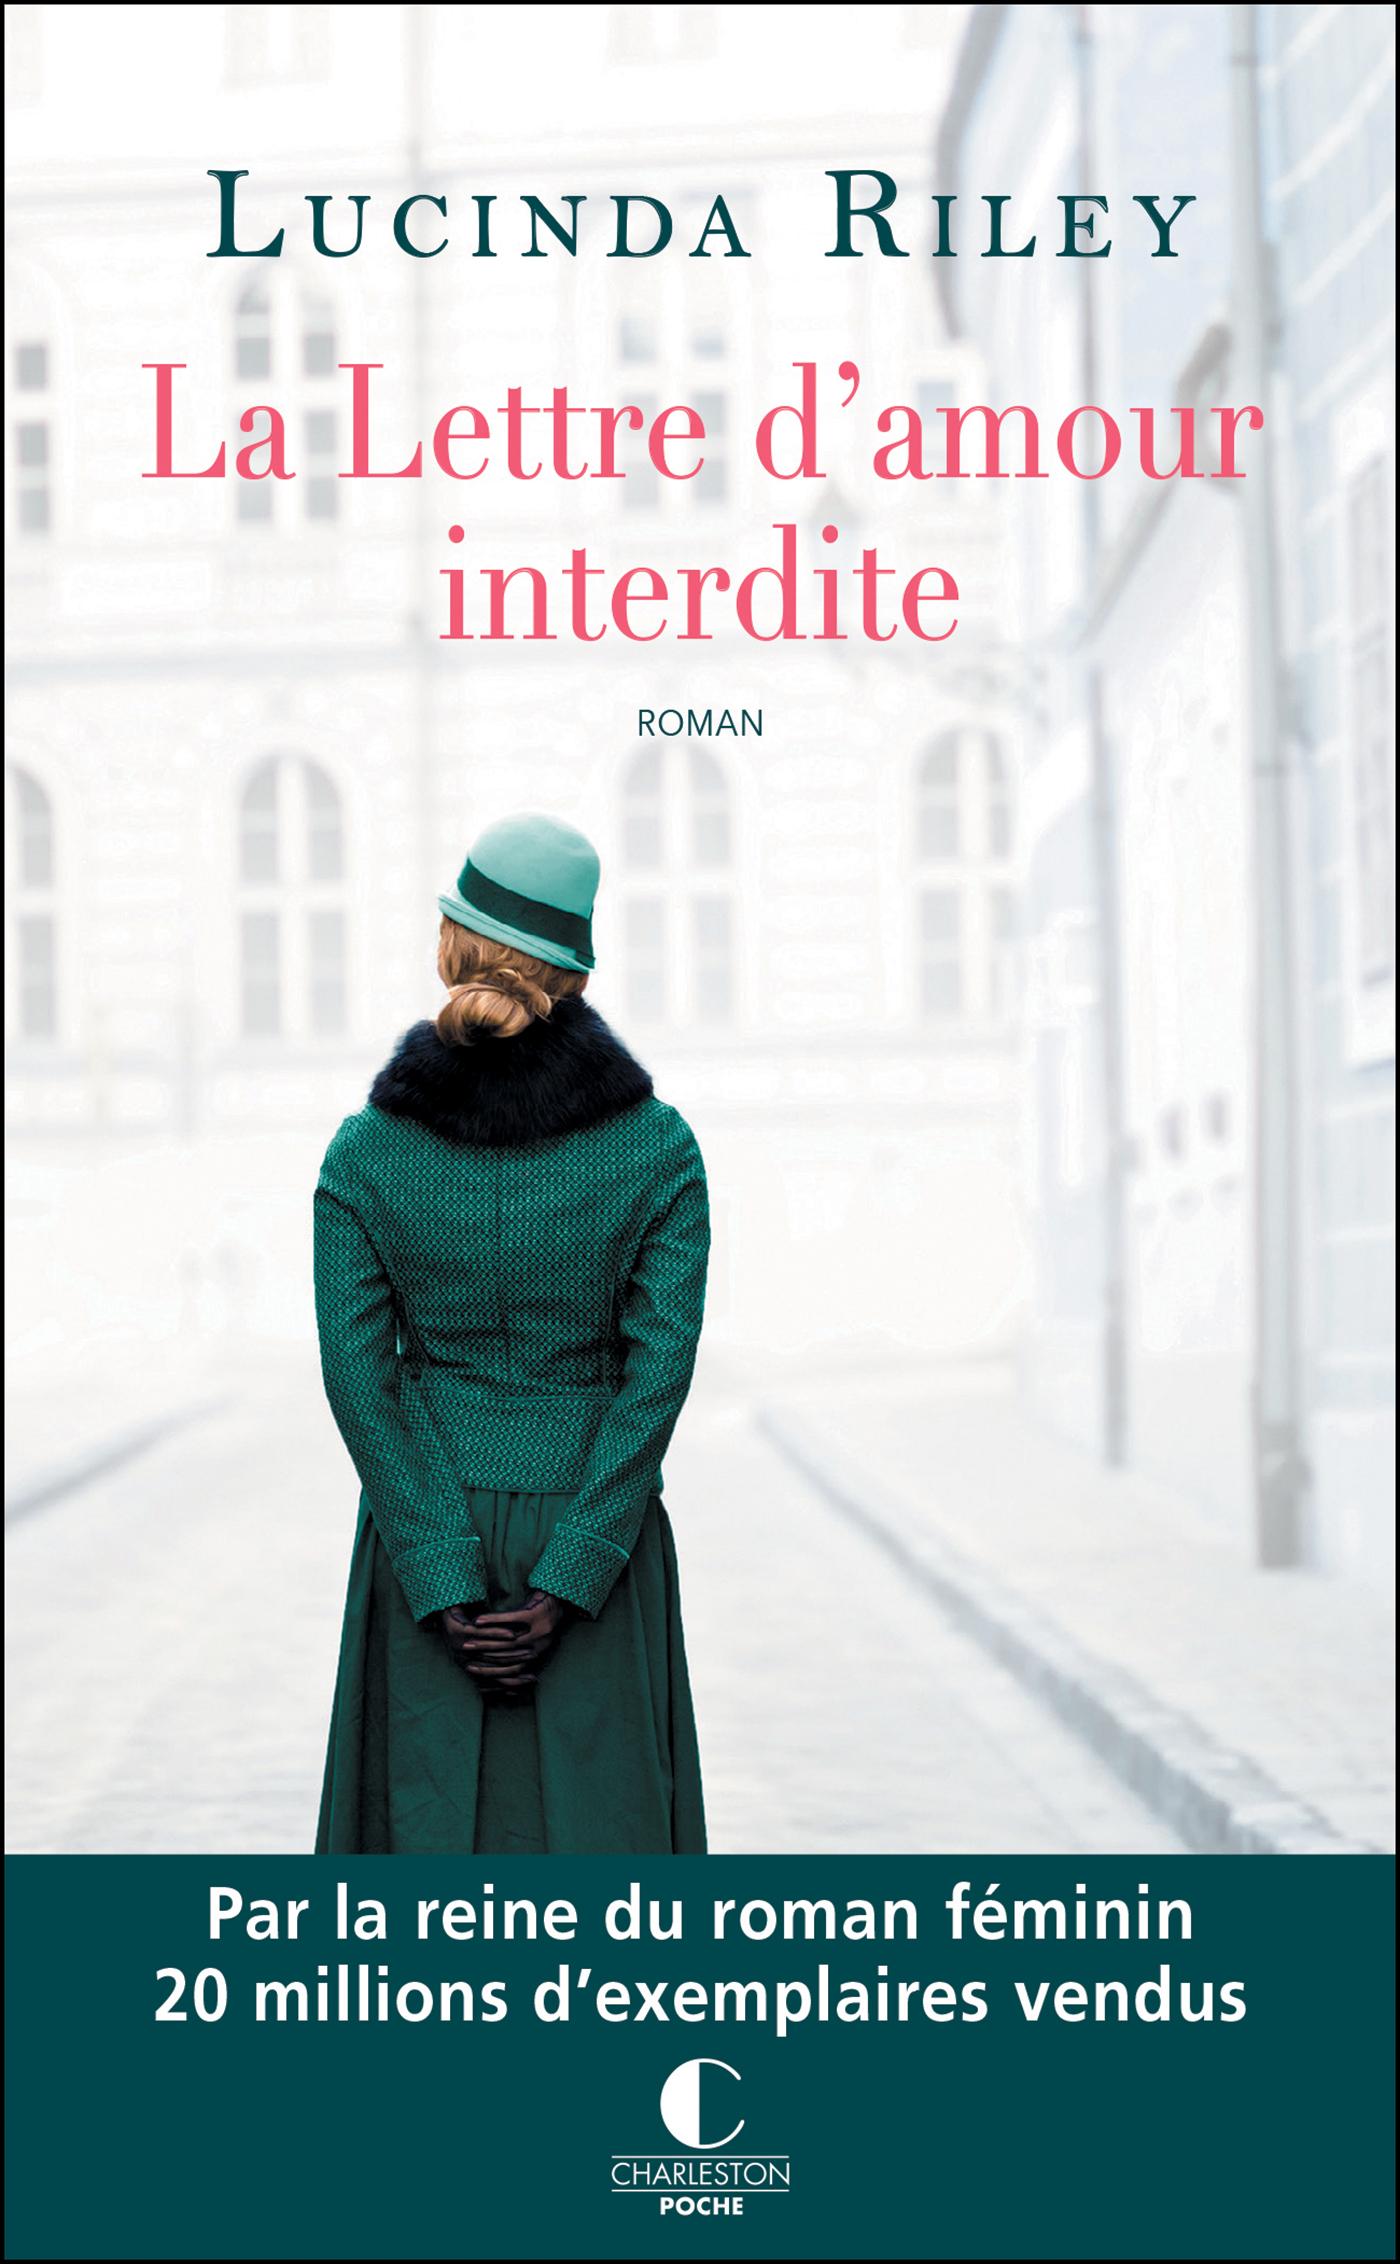 LA LETTRE D'AMOUR INTERDITE